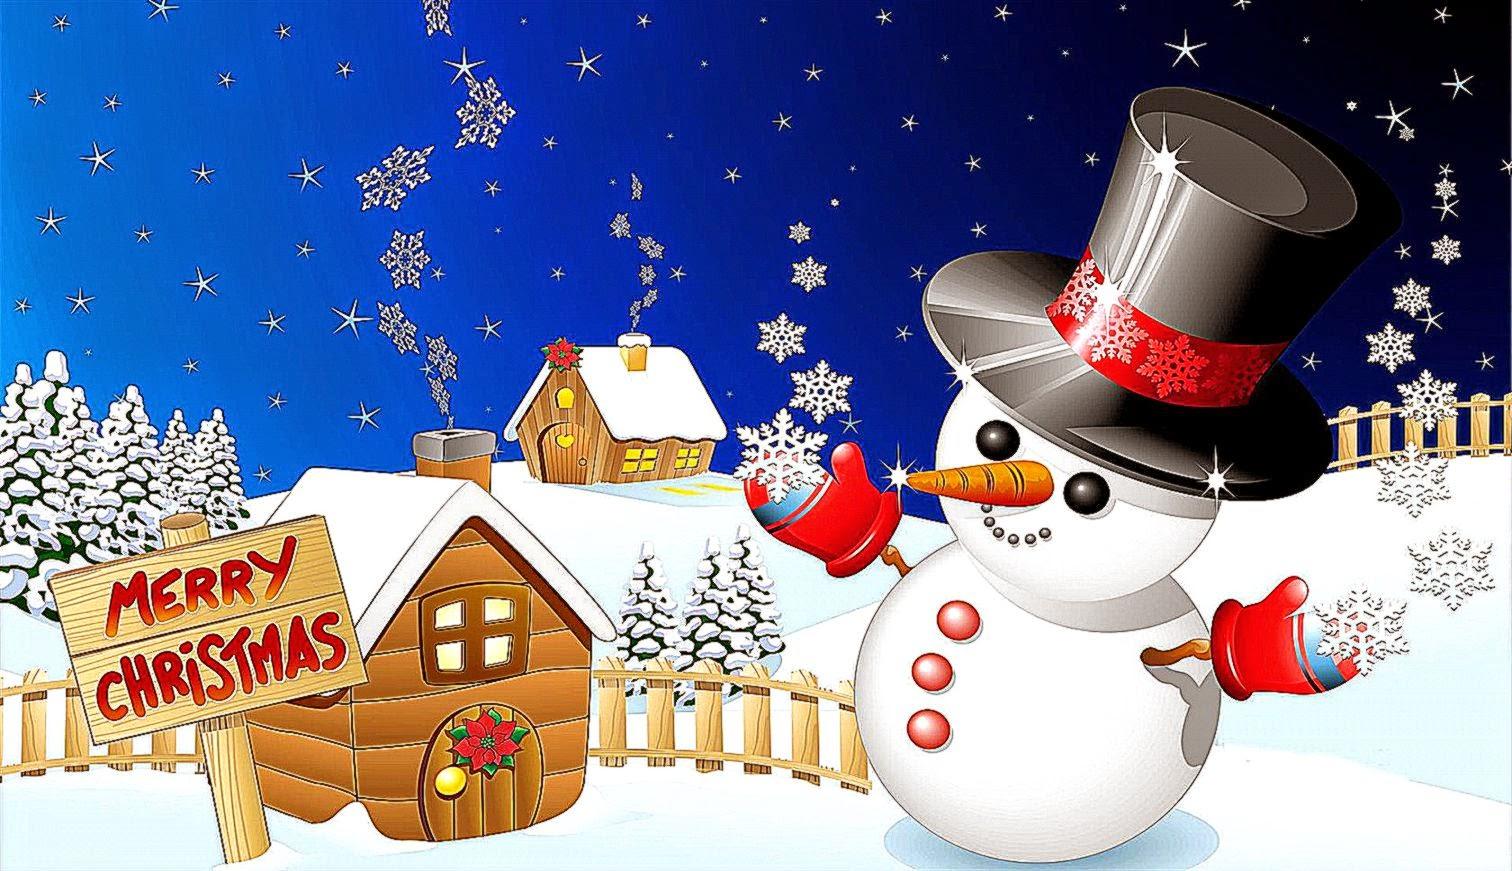 Free Download Cute Snowman Christmas Wallpaper Wallpapers